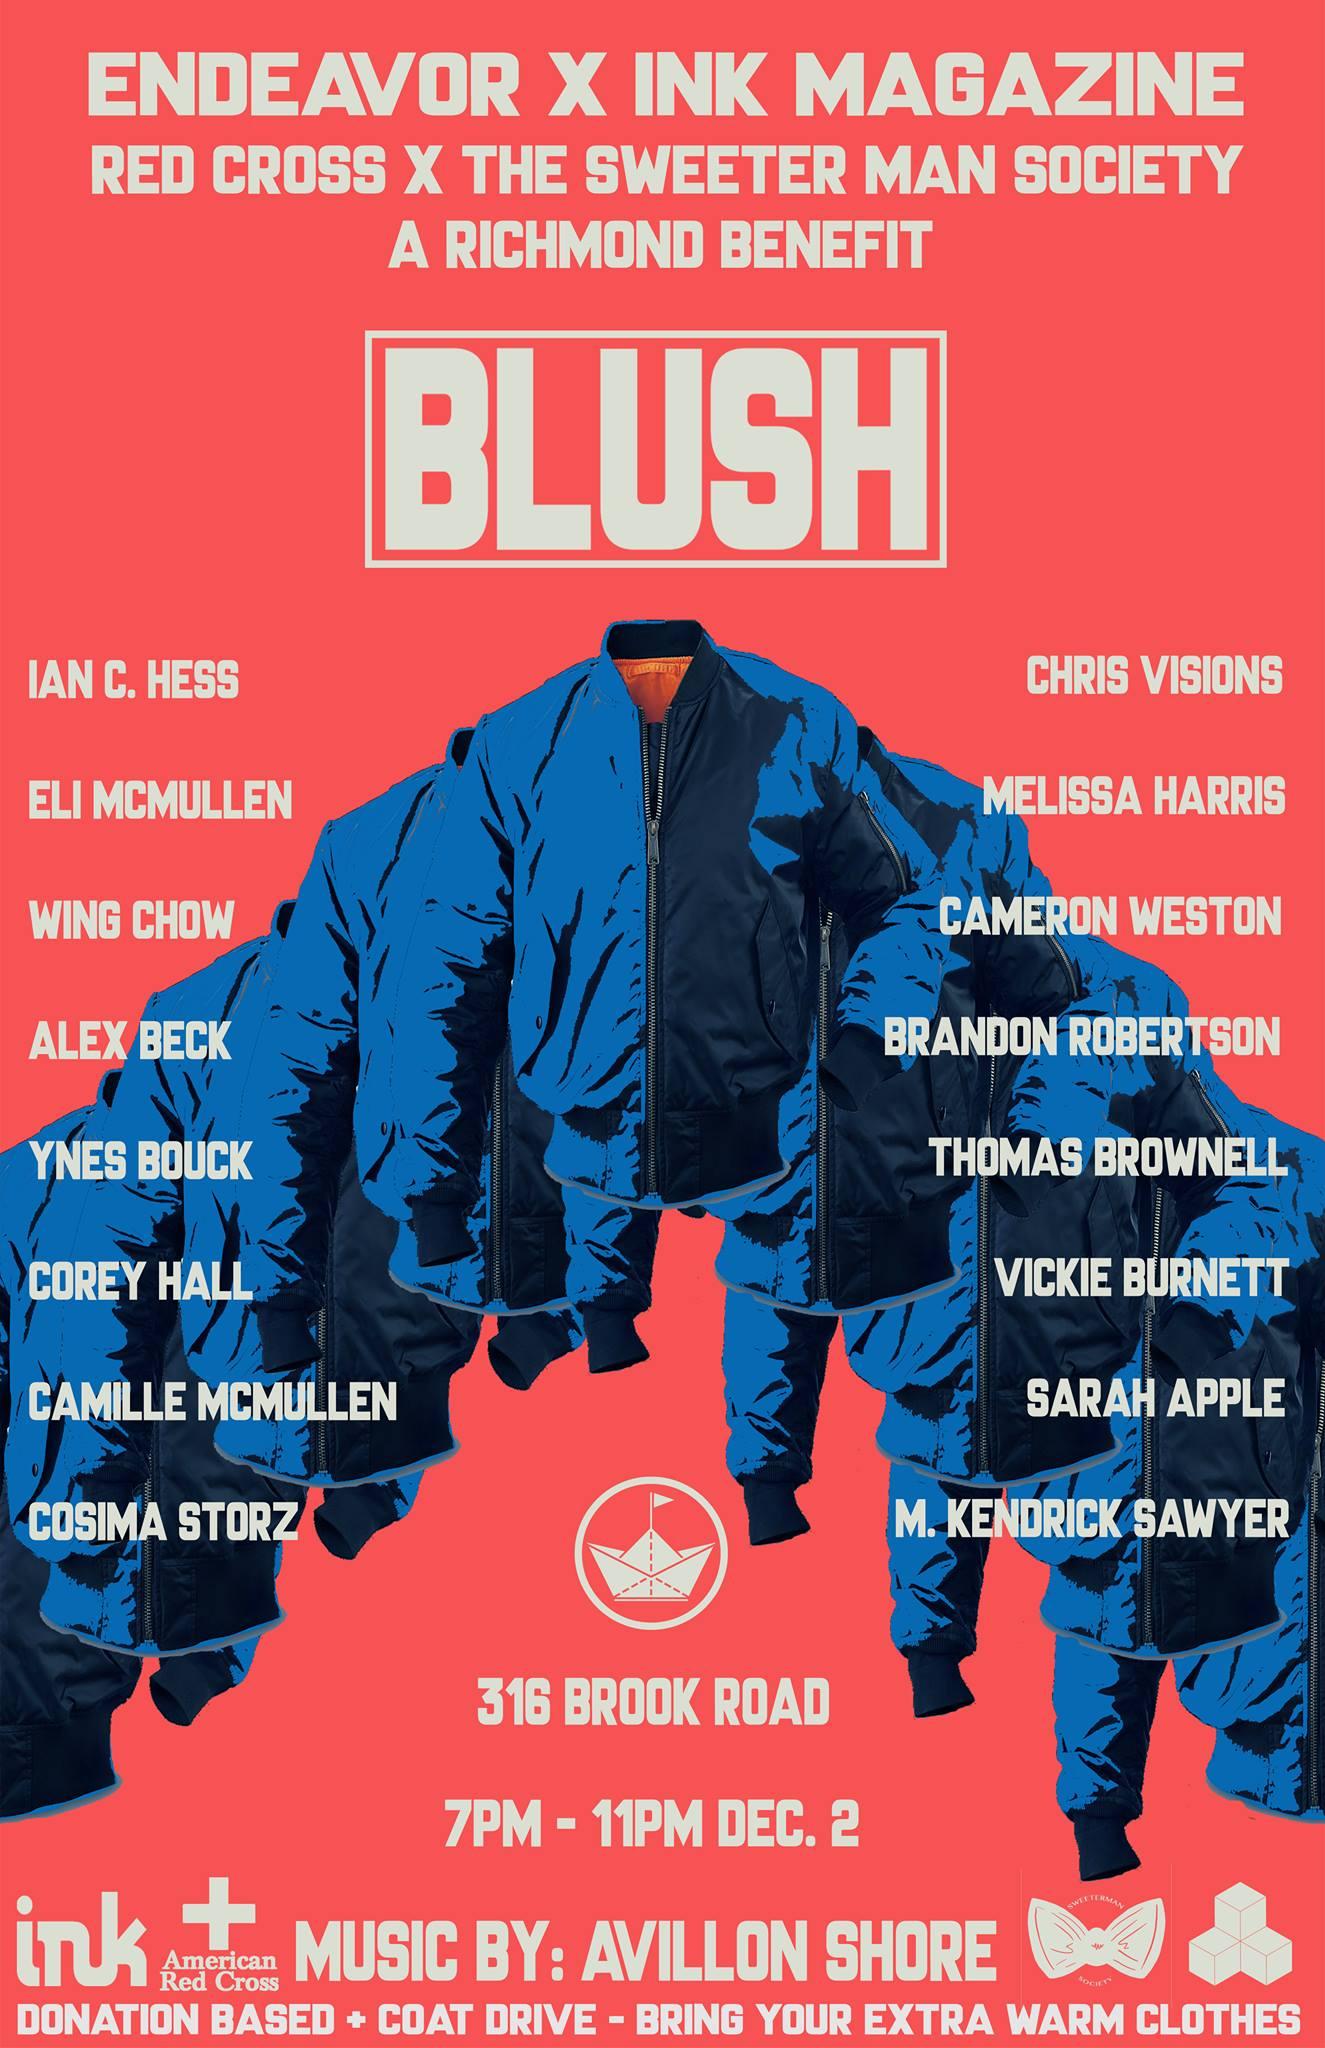 Endeavor x Ink Magazine-Blush